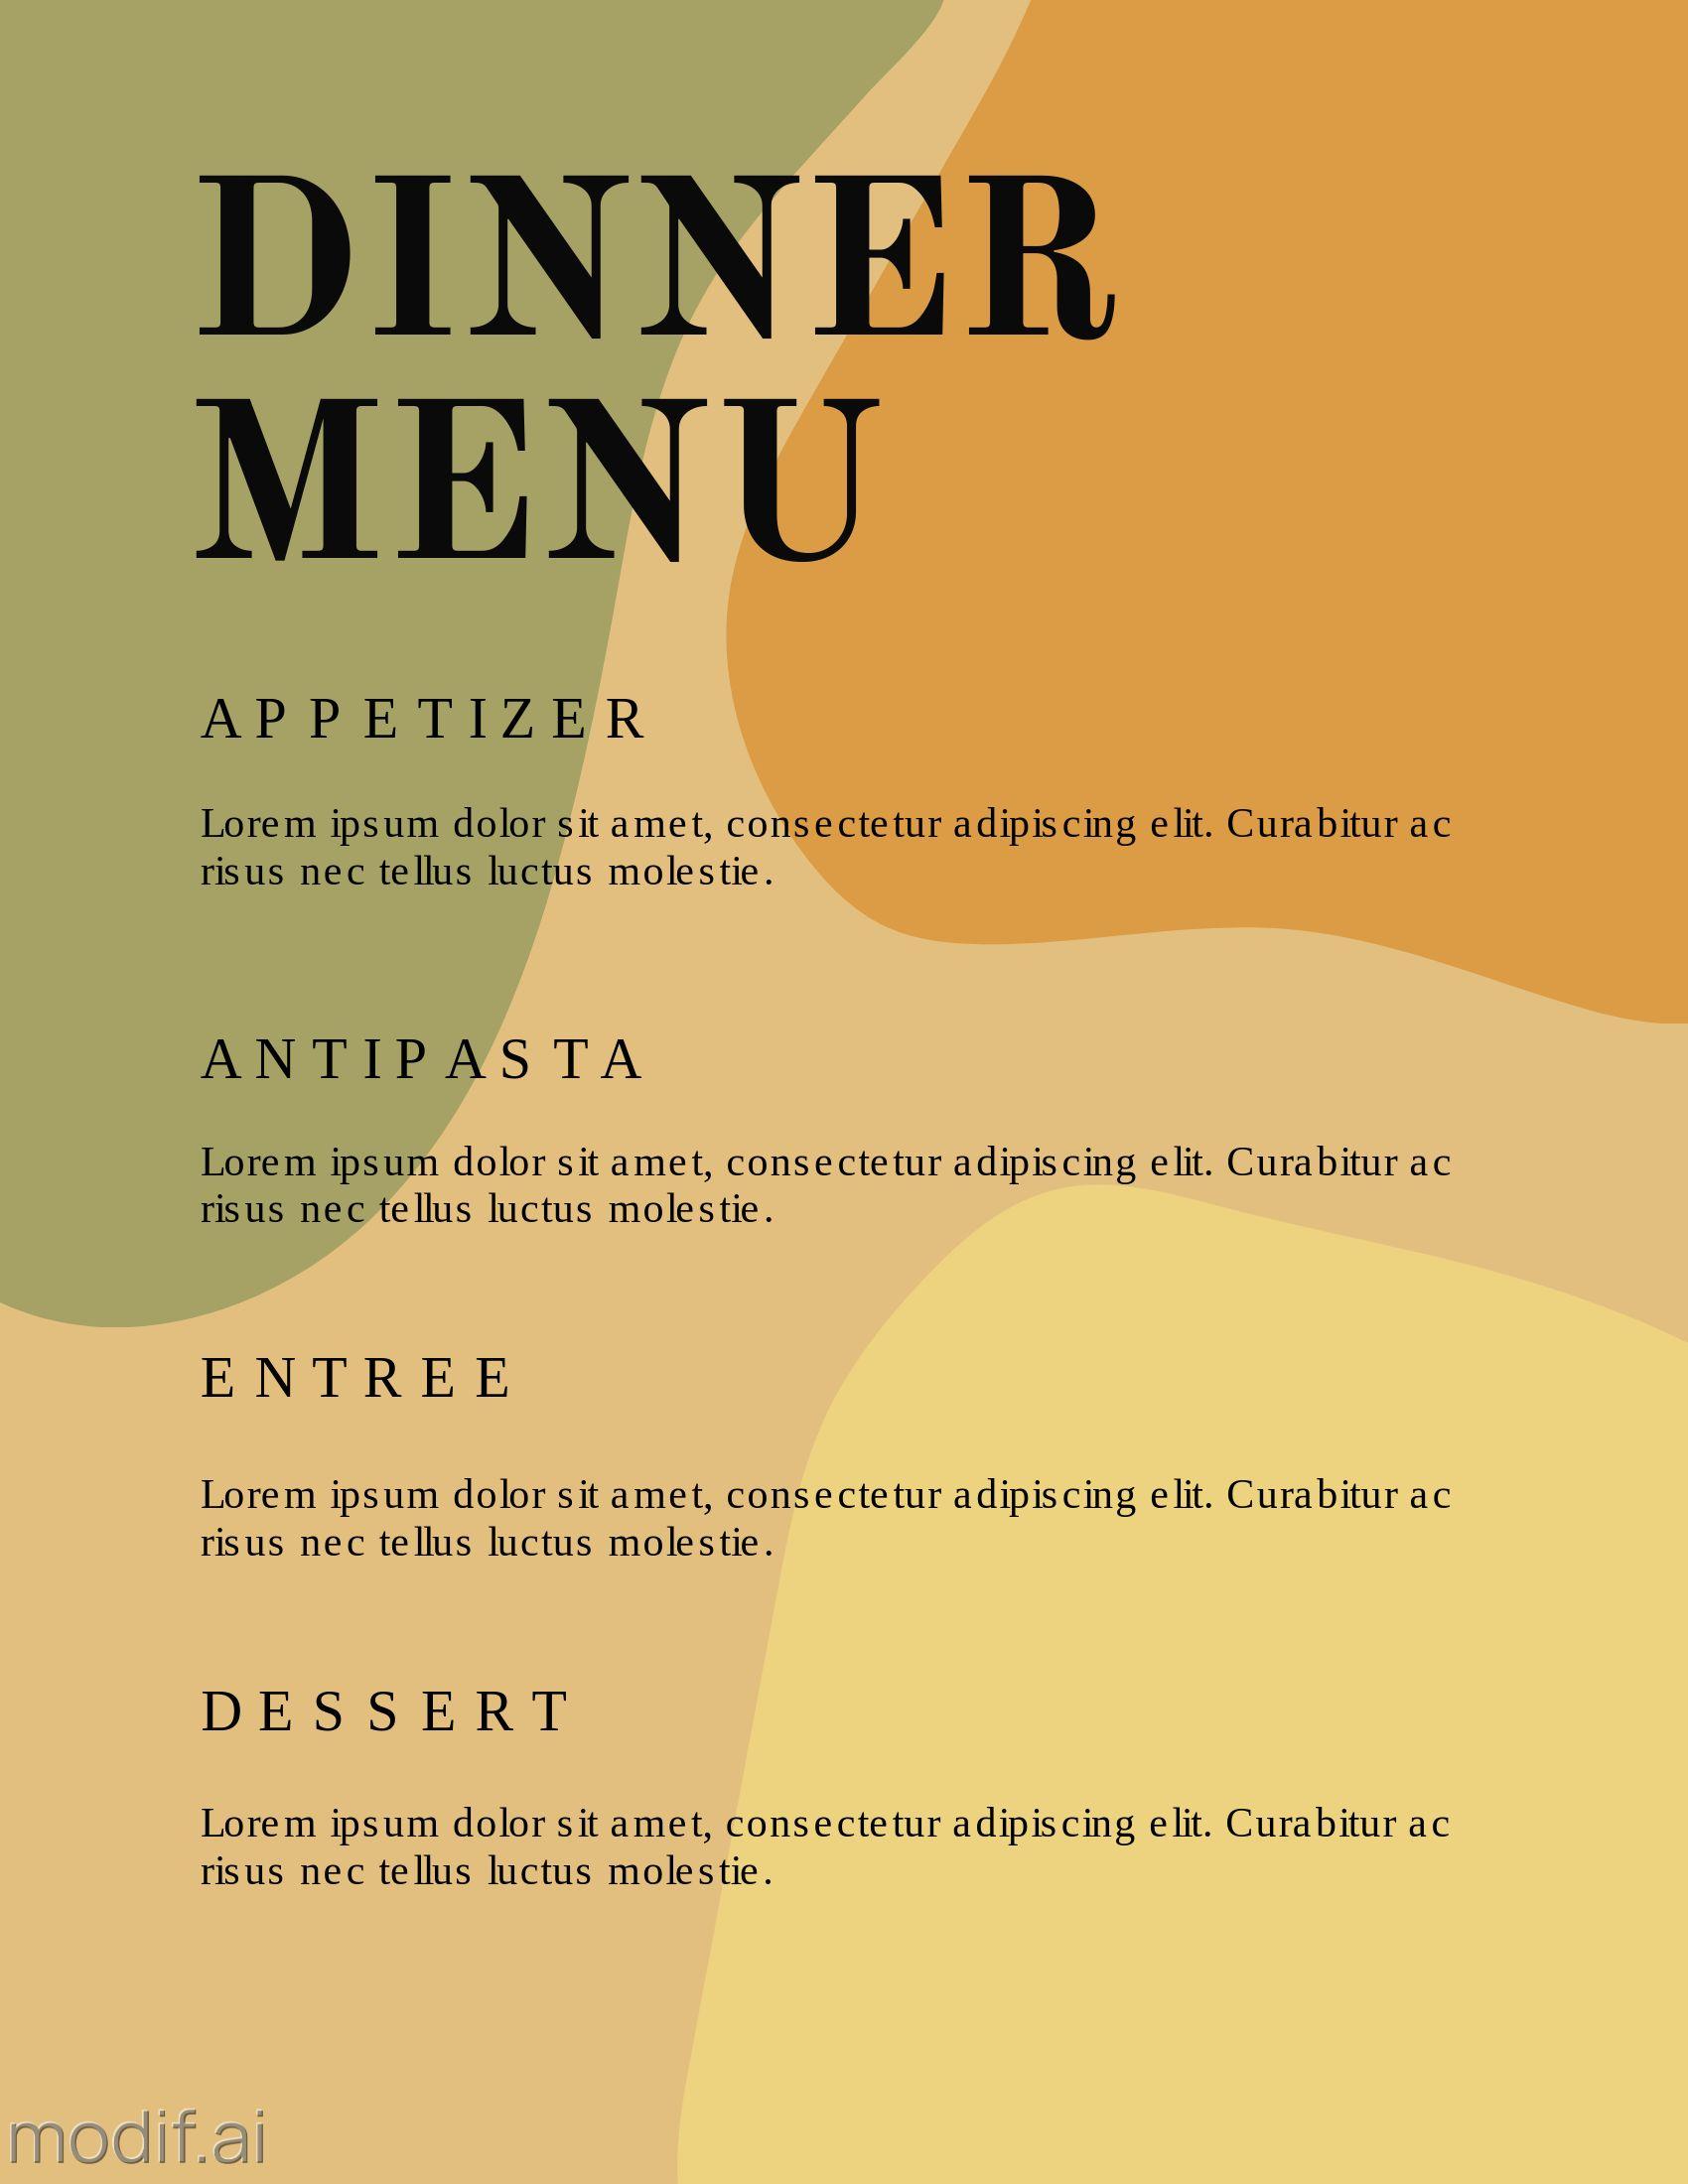 Restaurant Dinner Menu Pricing Guide Template